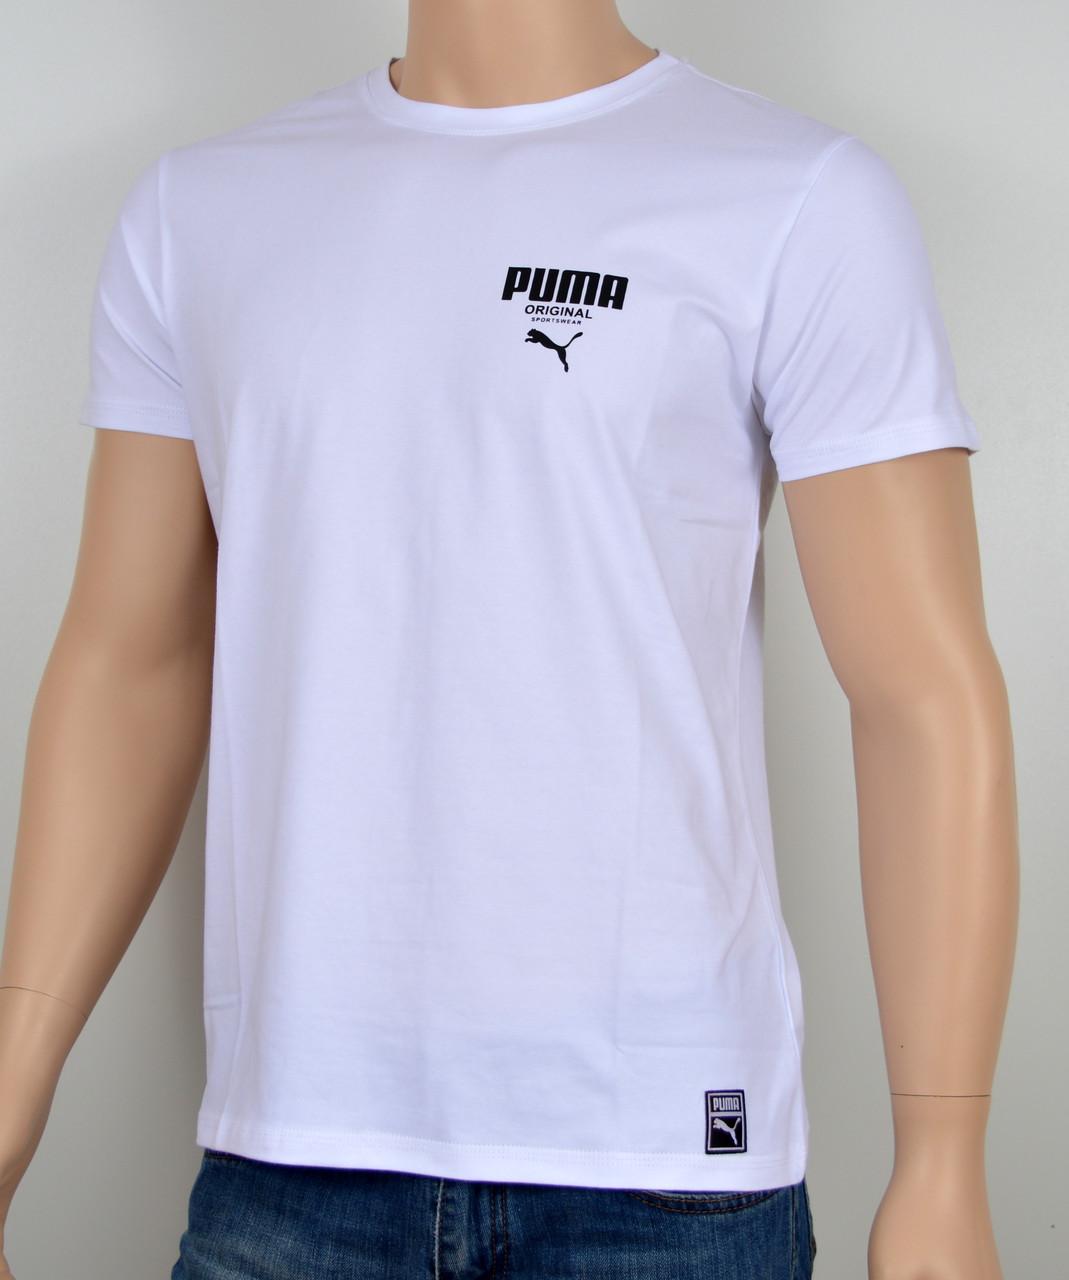 Футболки Puma оптом. PM1802 белый